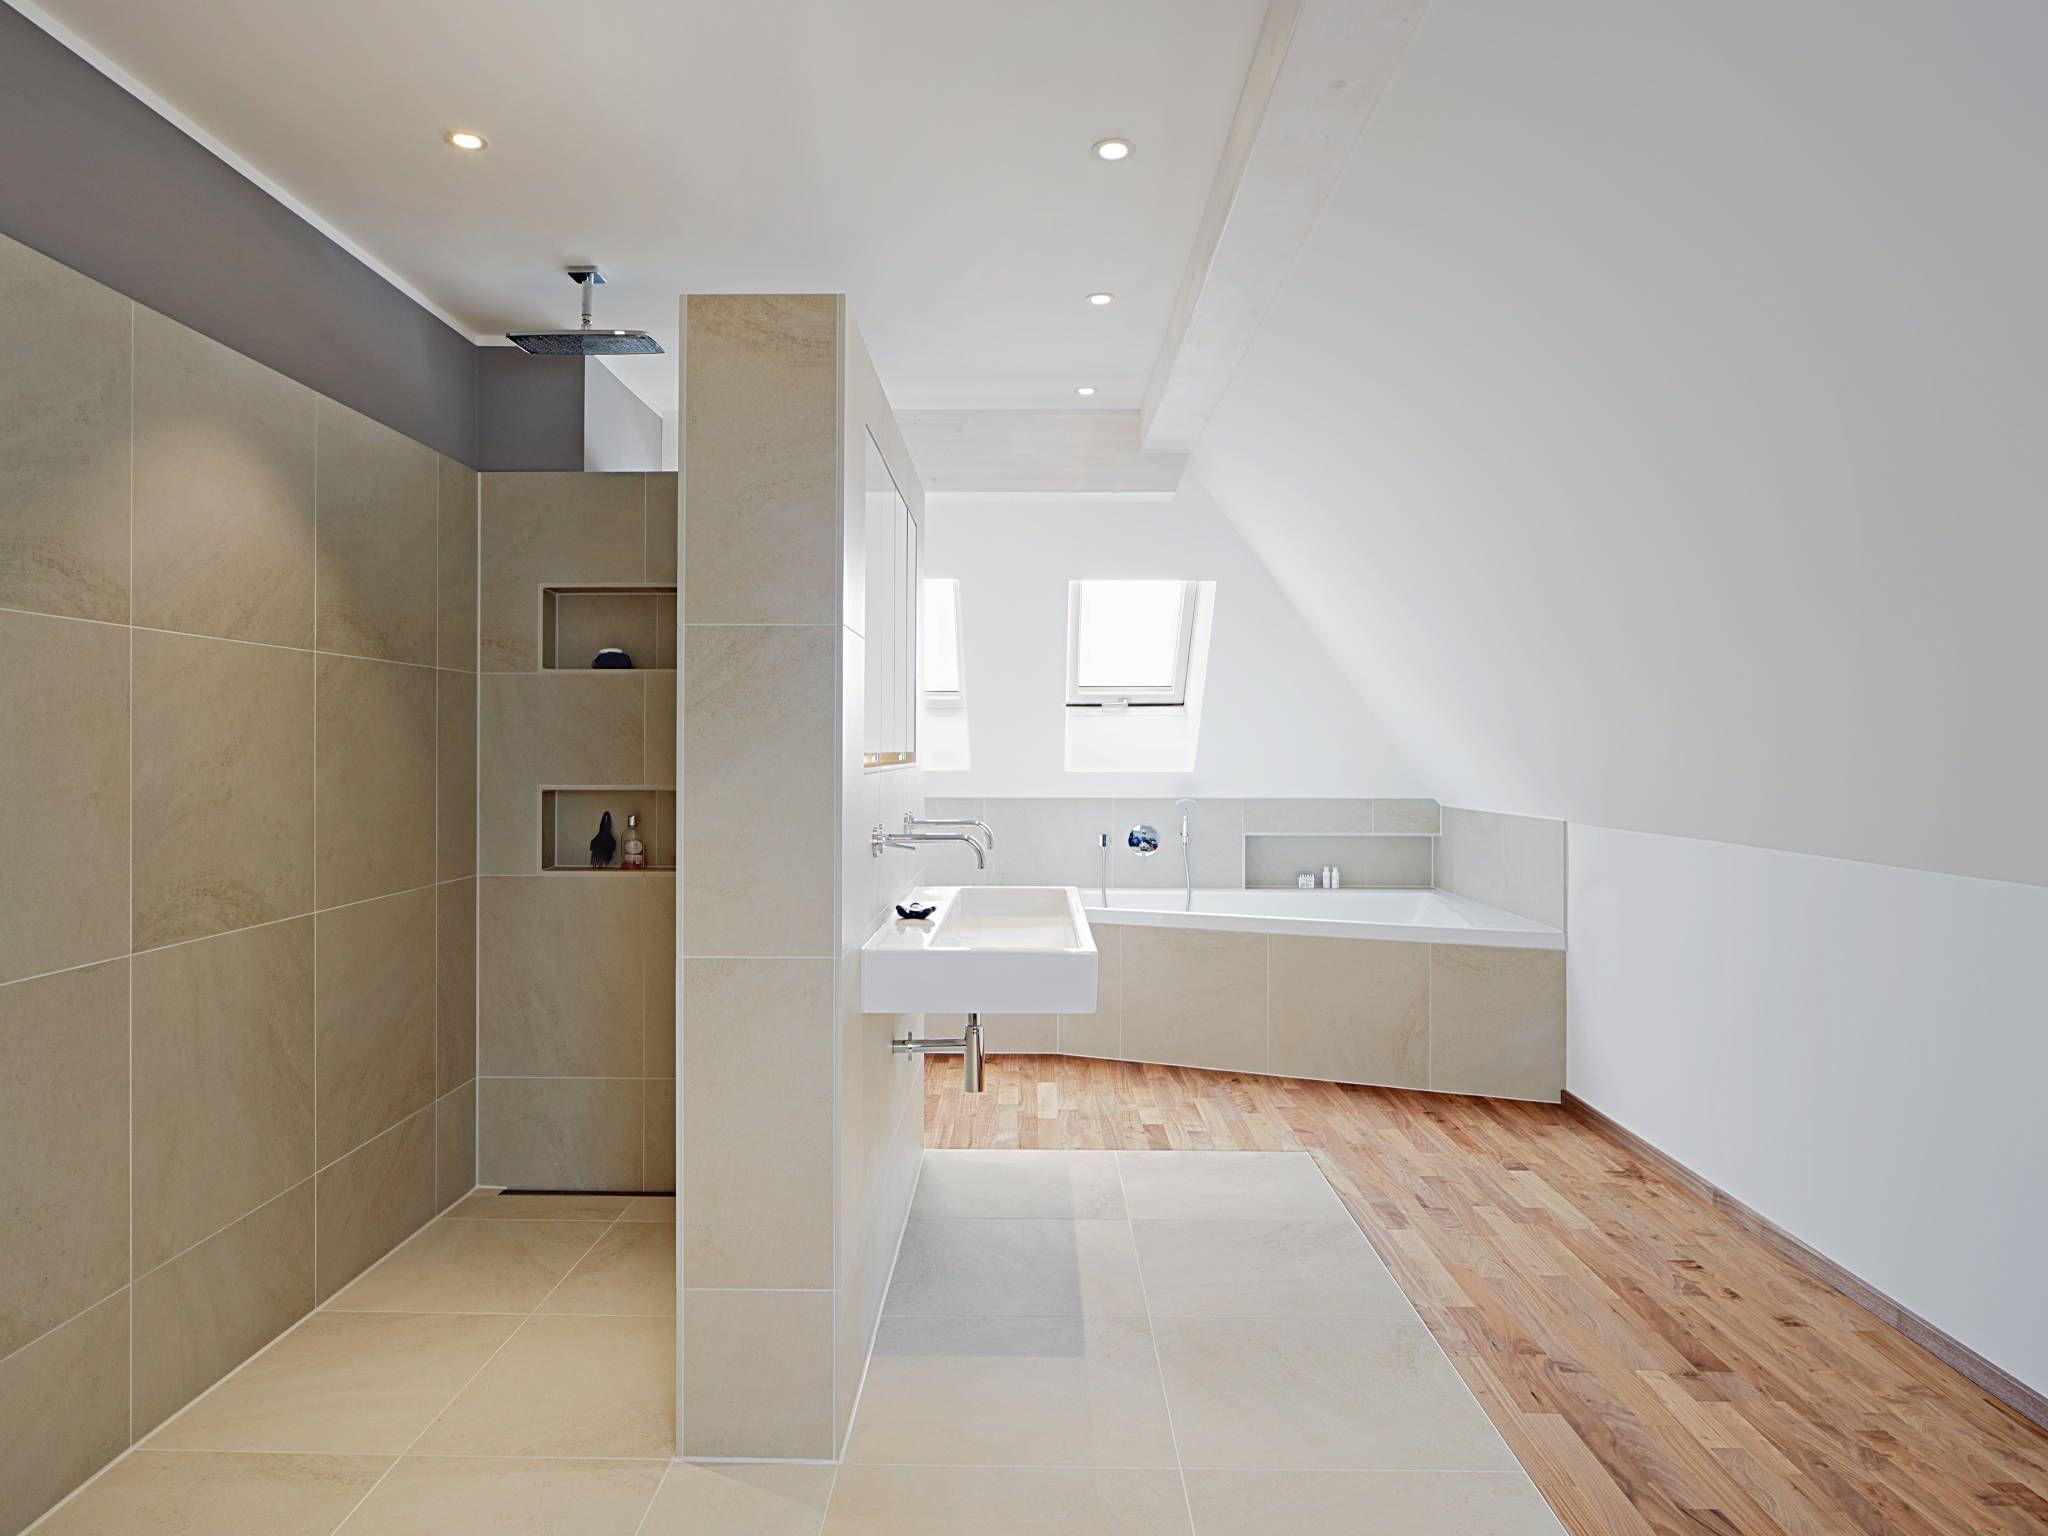 Bathroom: Modern Bathroom by Baufritz (UK) Ltd. | Bathroom Idea\'s ...